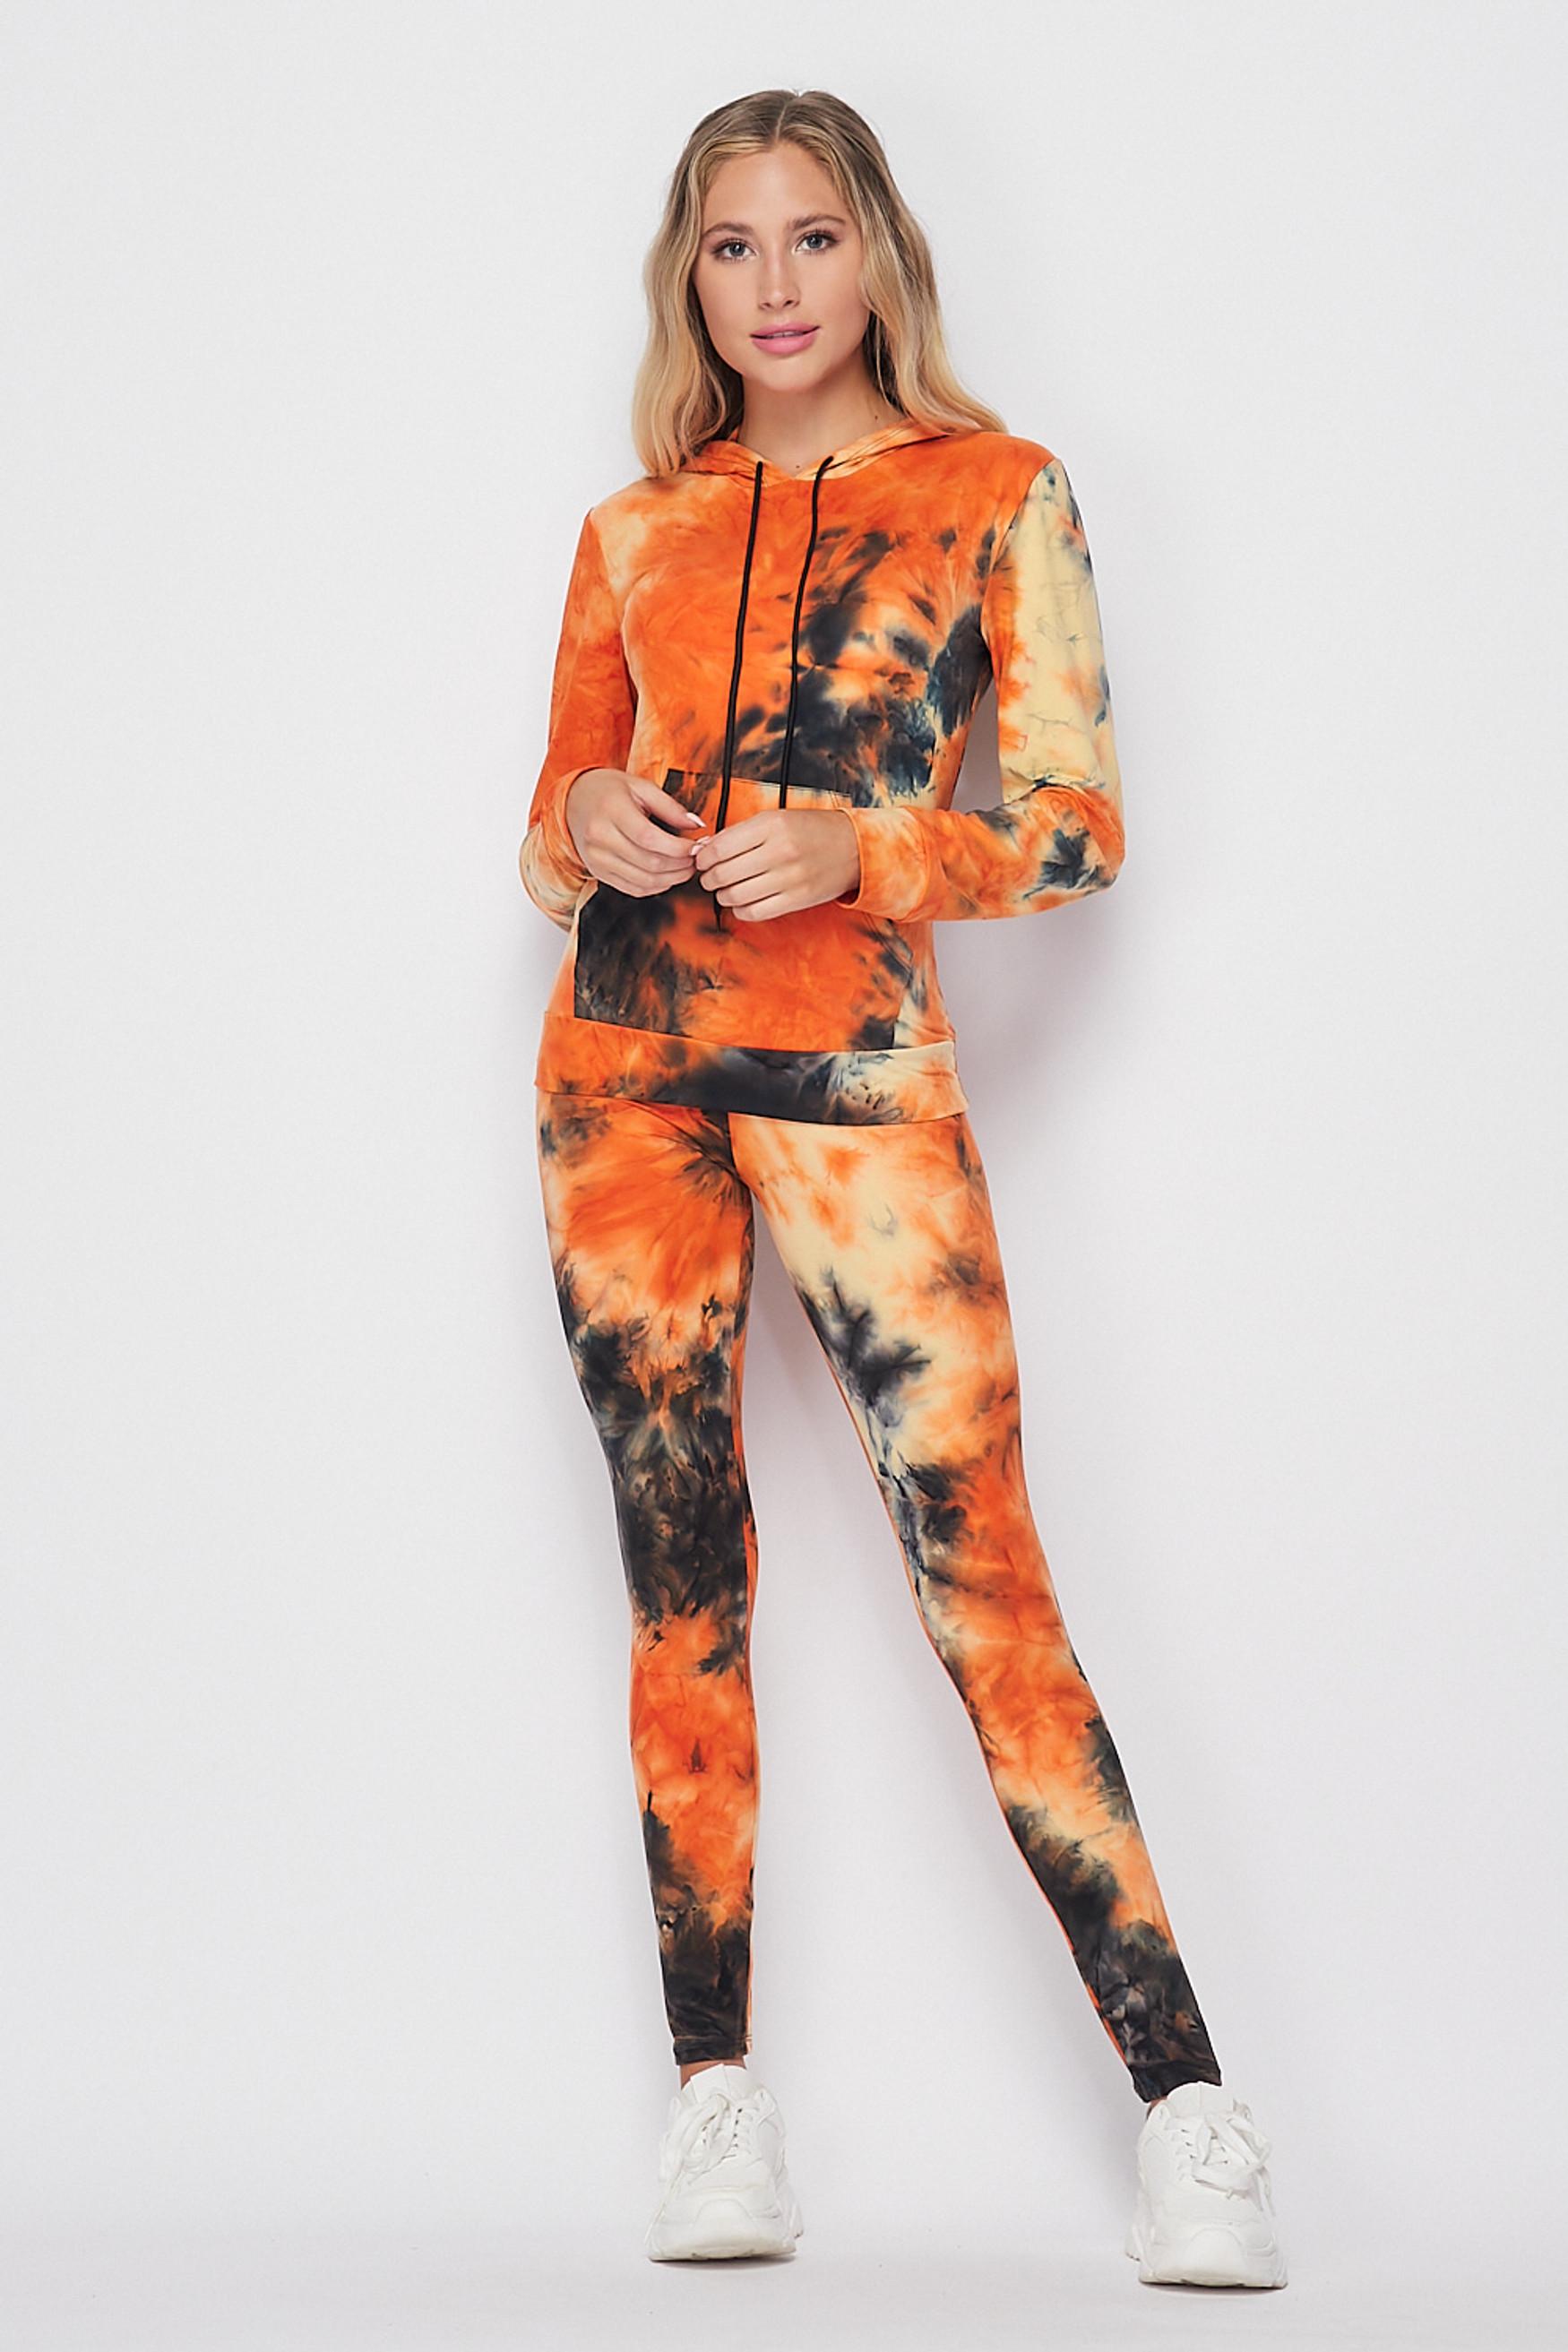 Front side image of Orange Tie Dye 2 Piece Leggings and Hooded Jacket Set